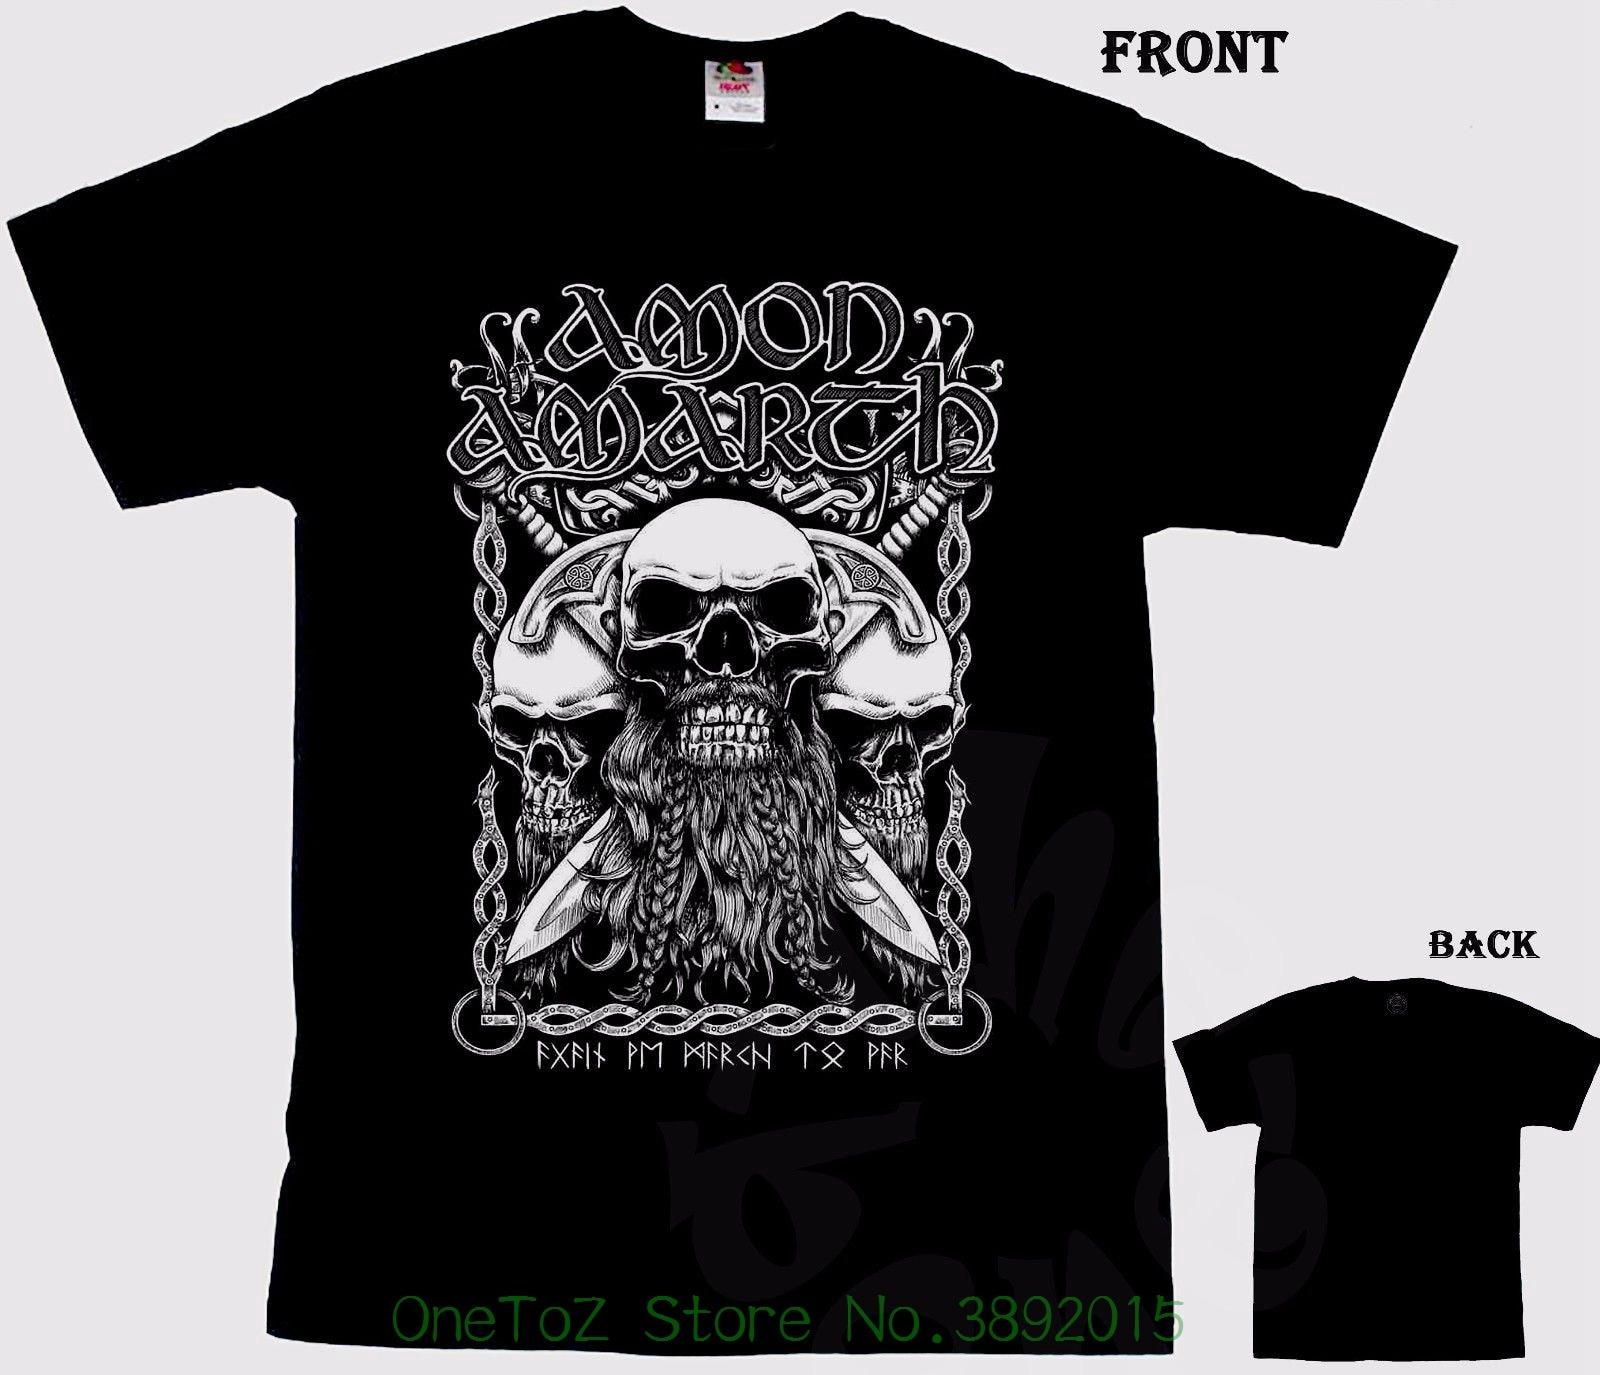 2018 Summer T-shirts For Men Amon Amarth - Melodic Viking Death Metal Band , T-shirt - S ...